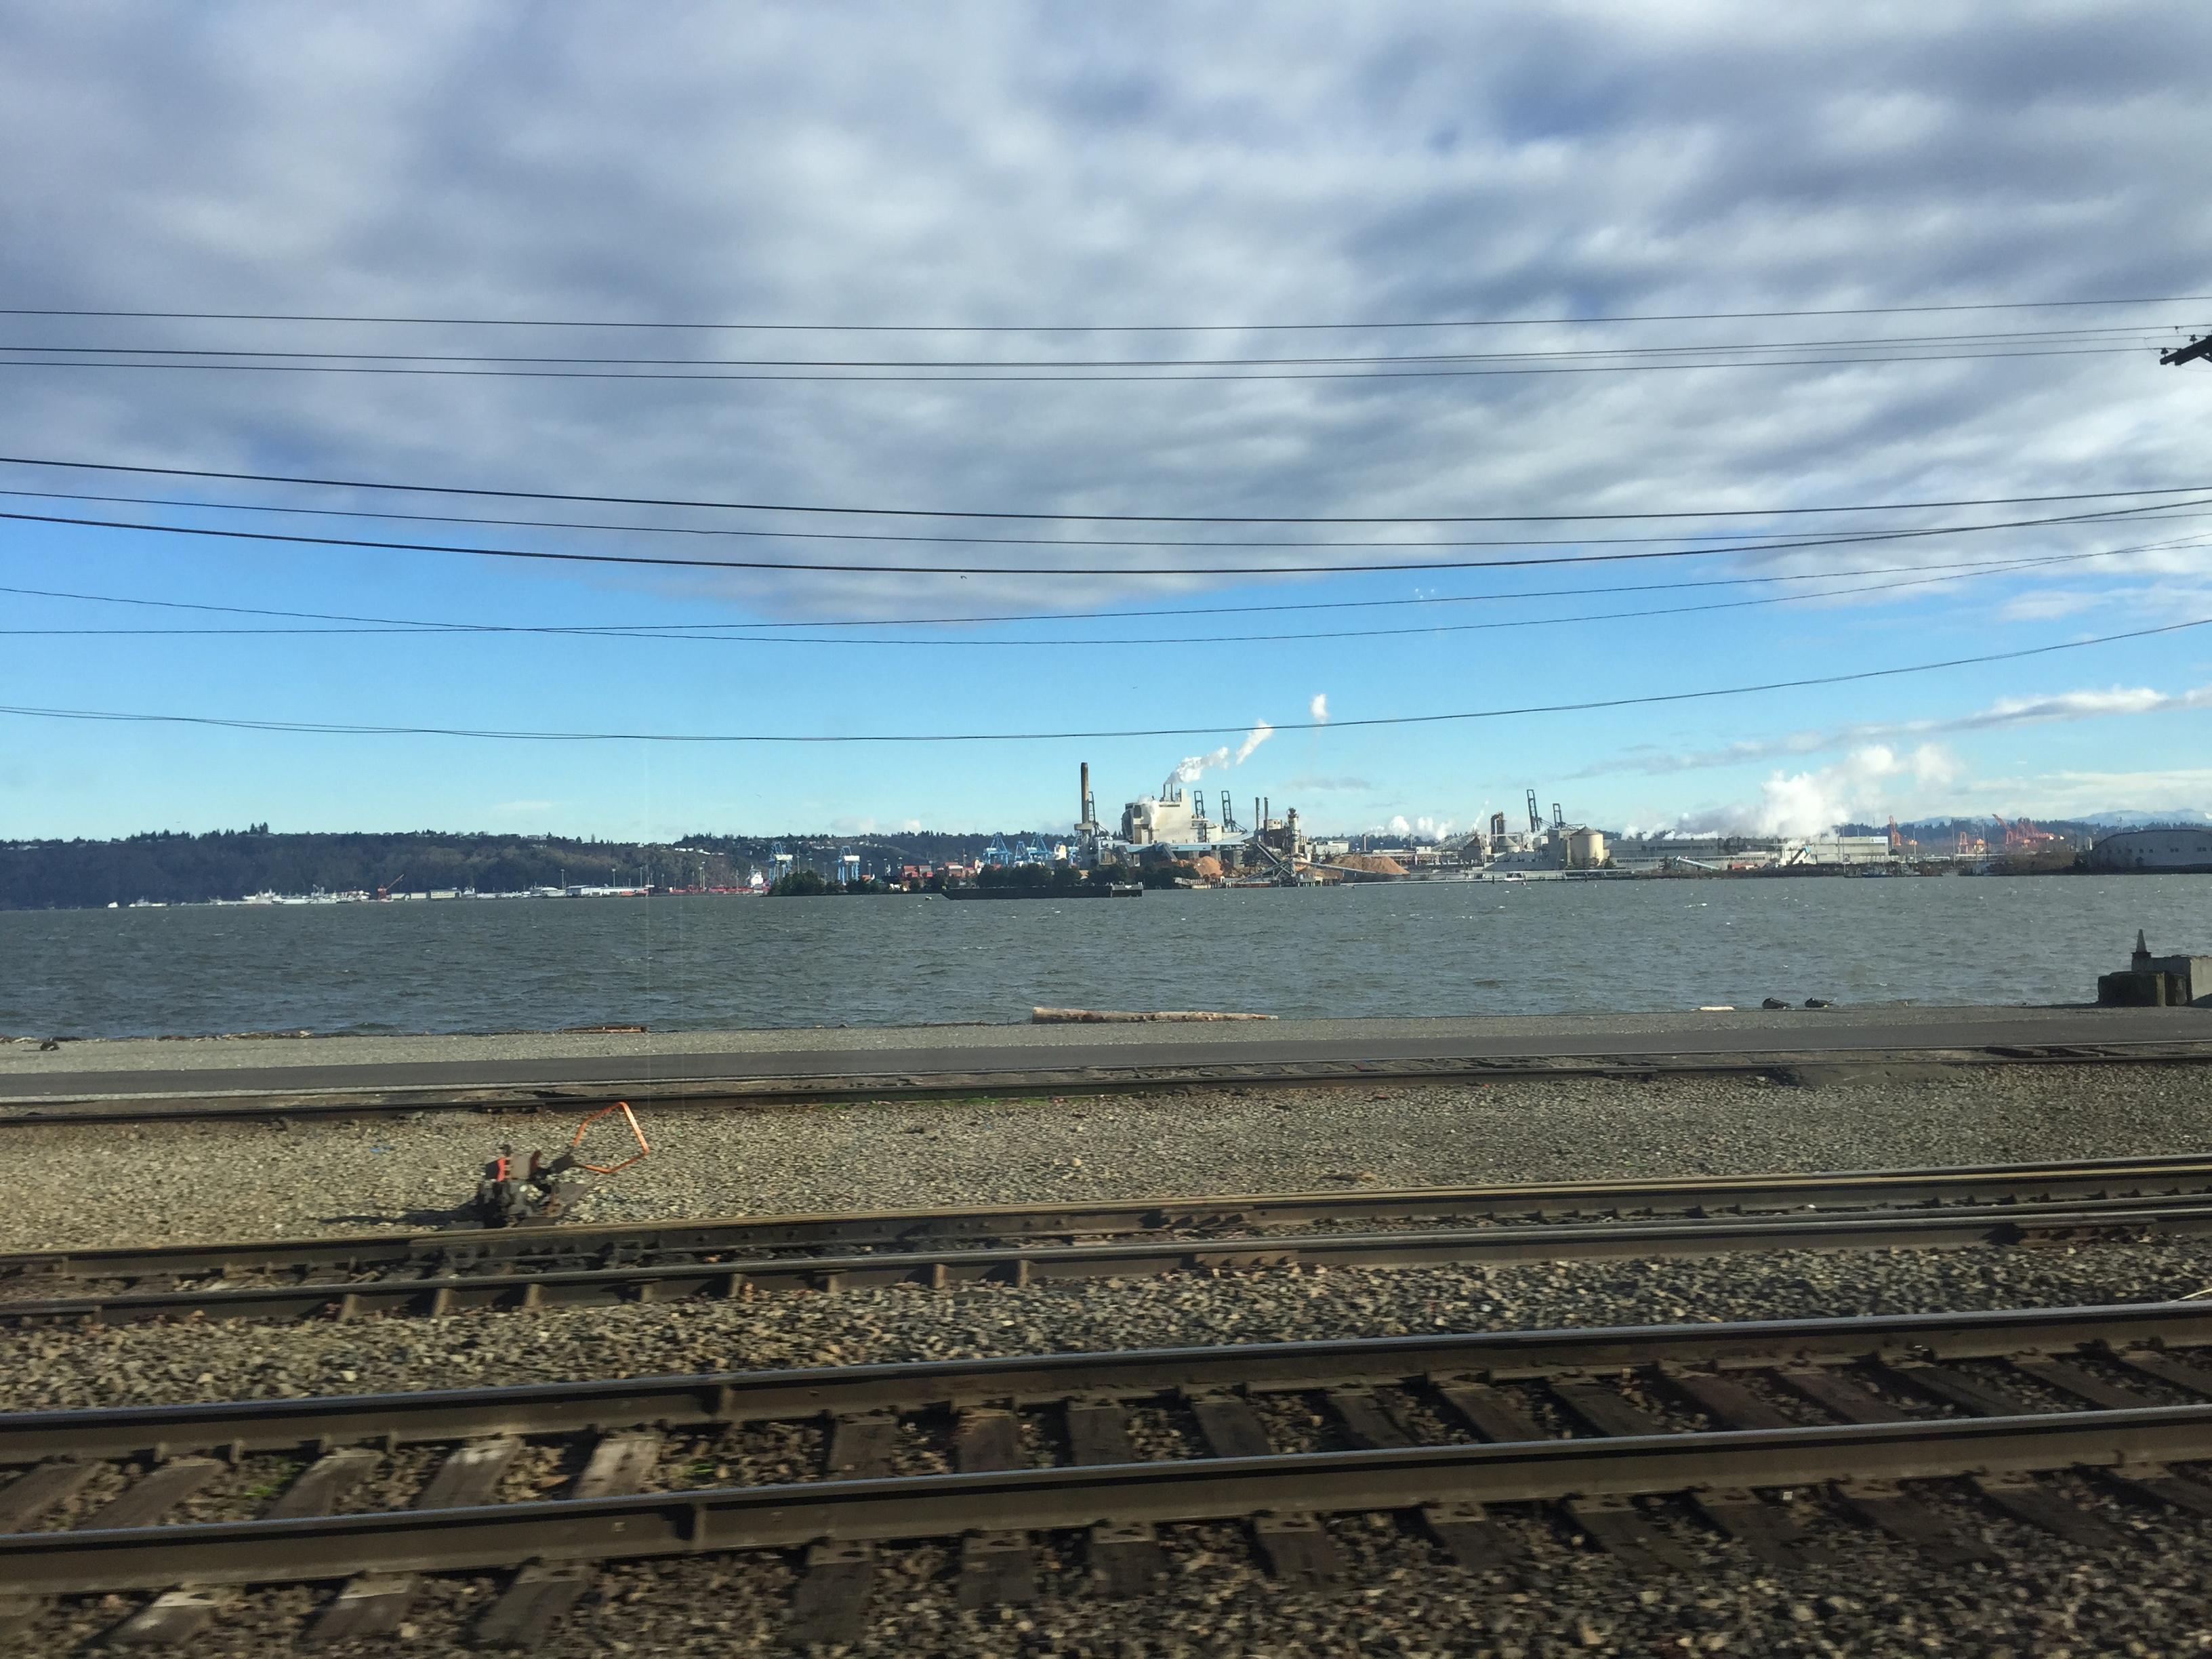 The Port of Tacoma